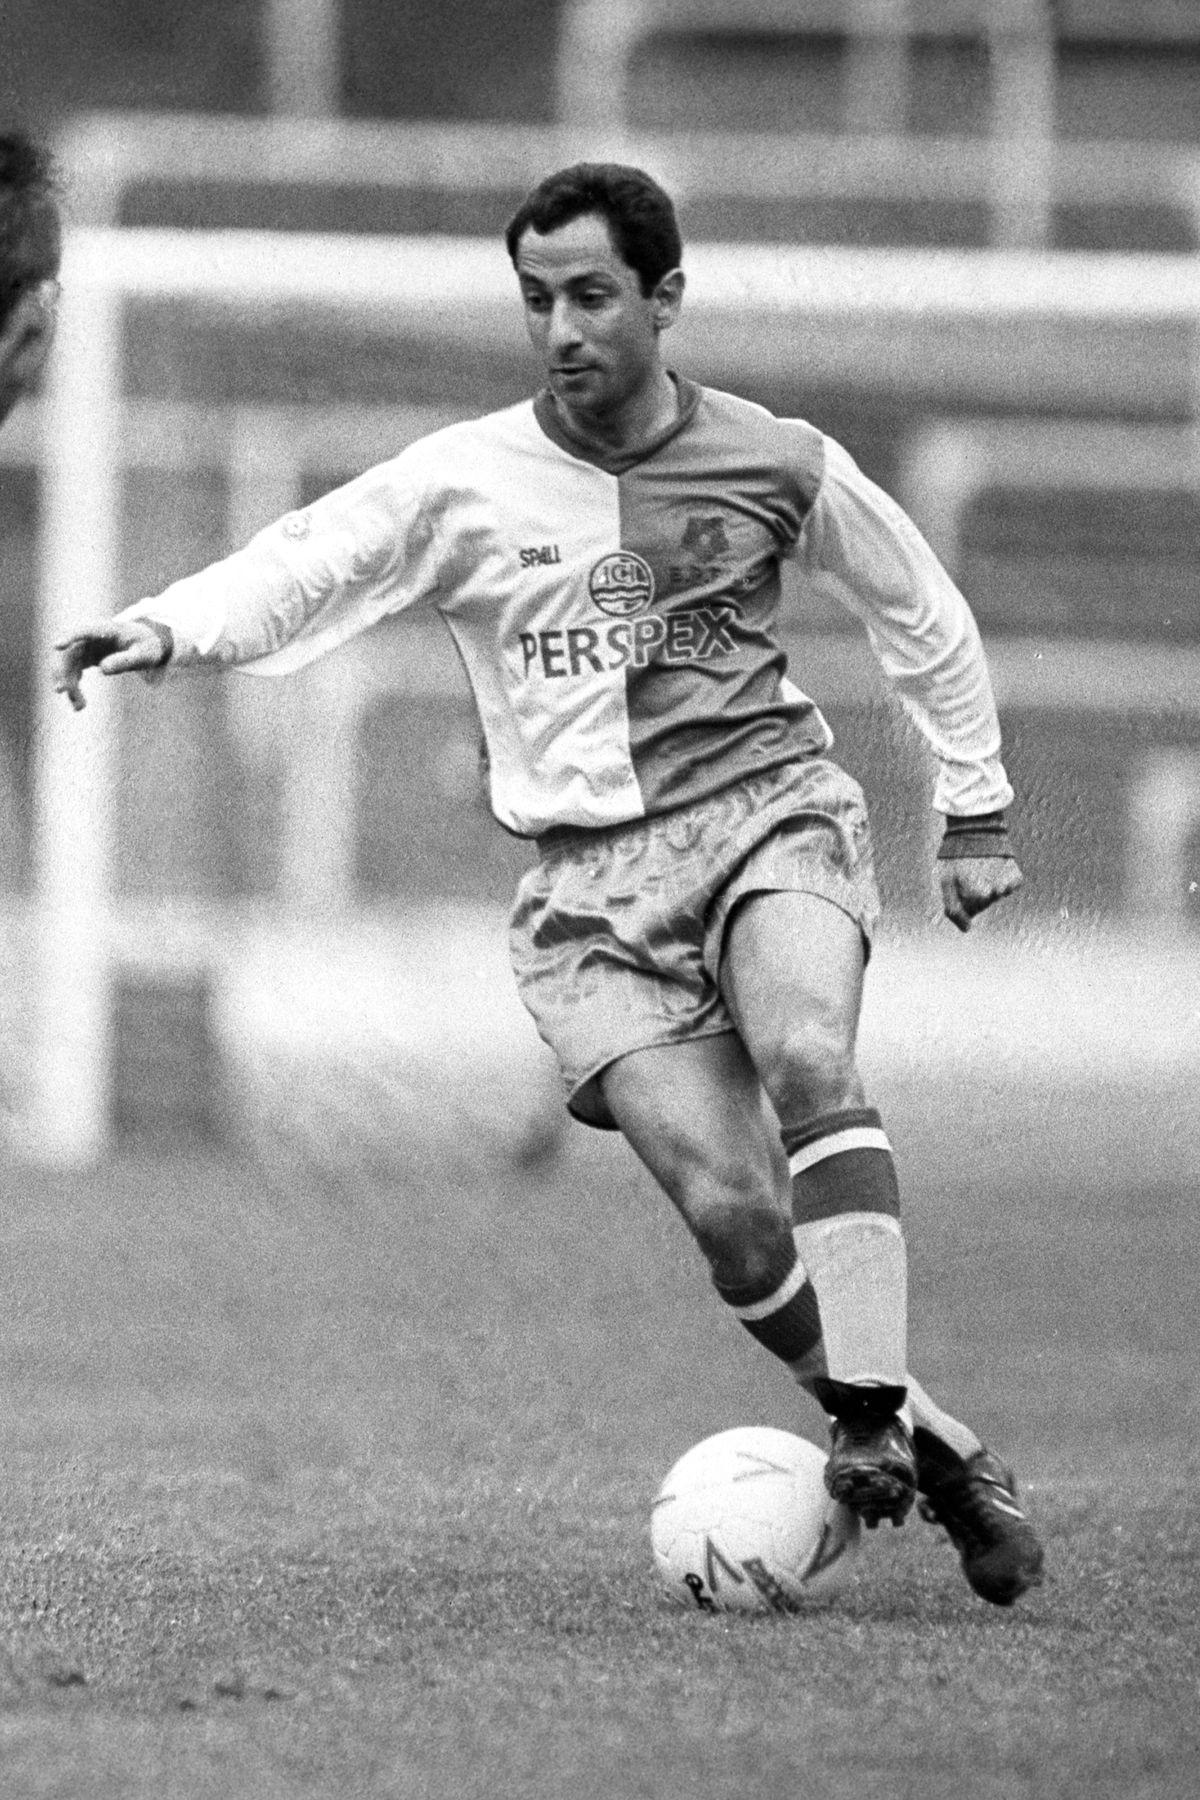 Soccer - Football League Centenary Tournament - Opening round - Aston Villa v Blackburn Rovers - Wembley Stadium